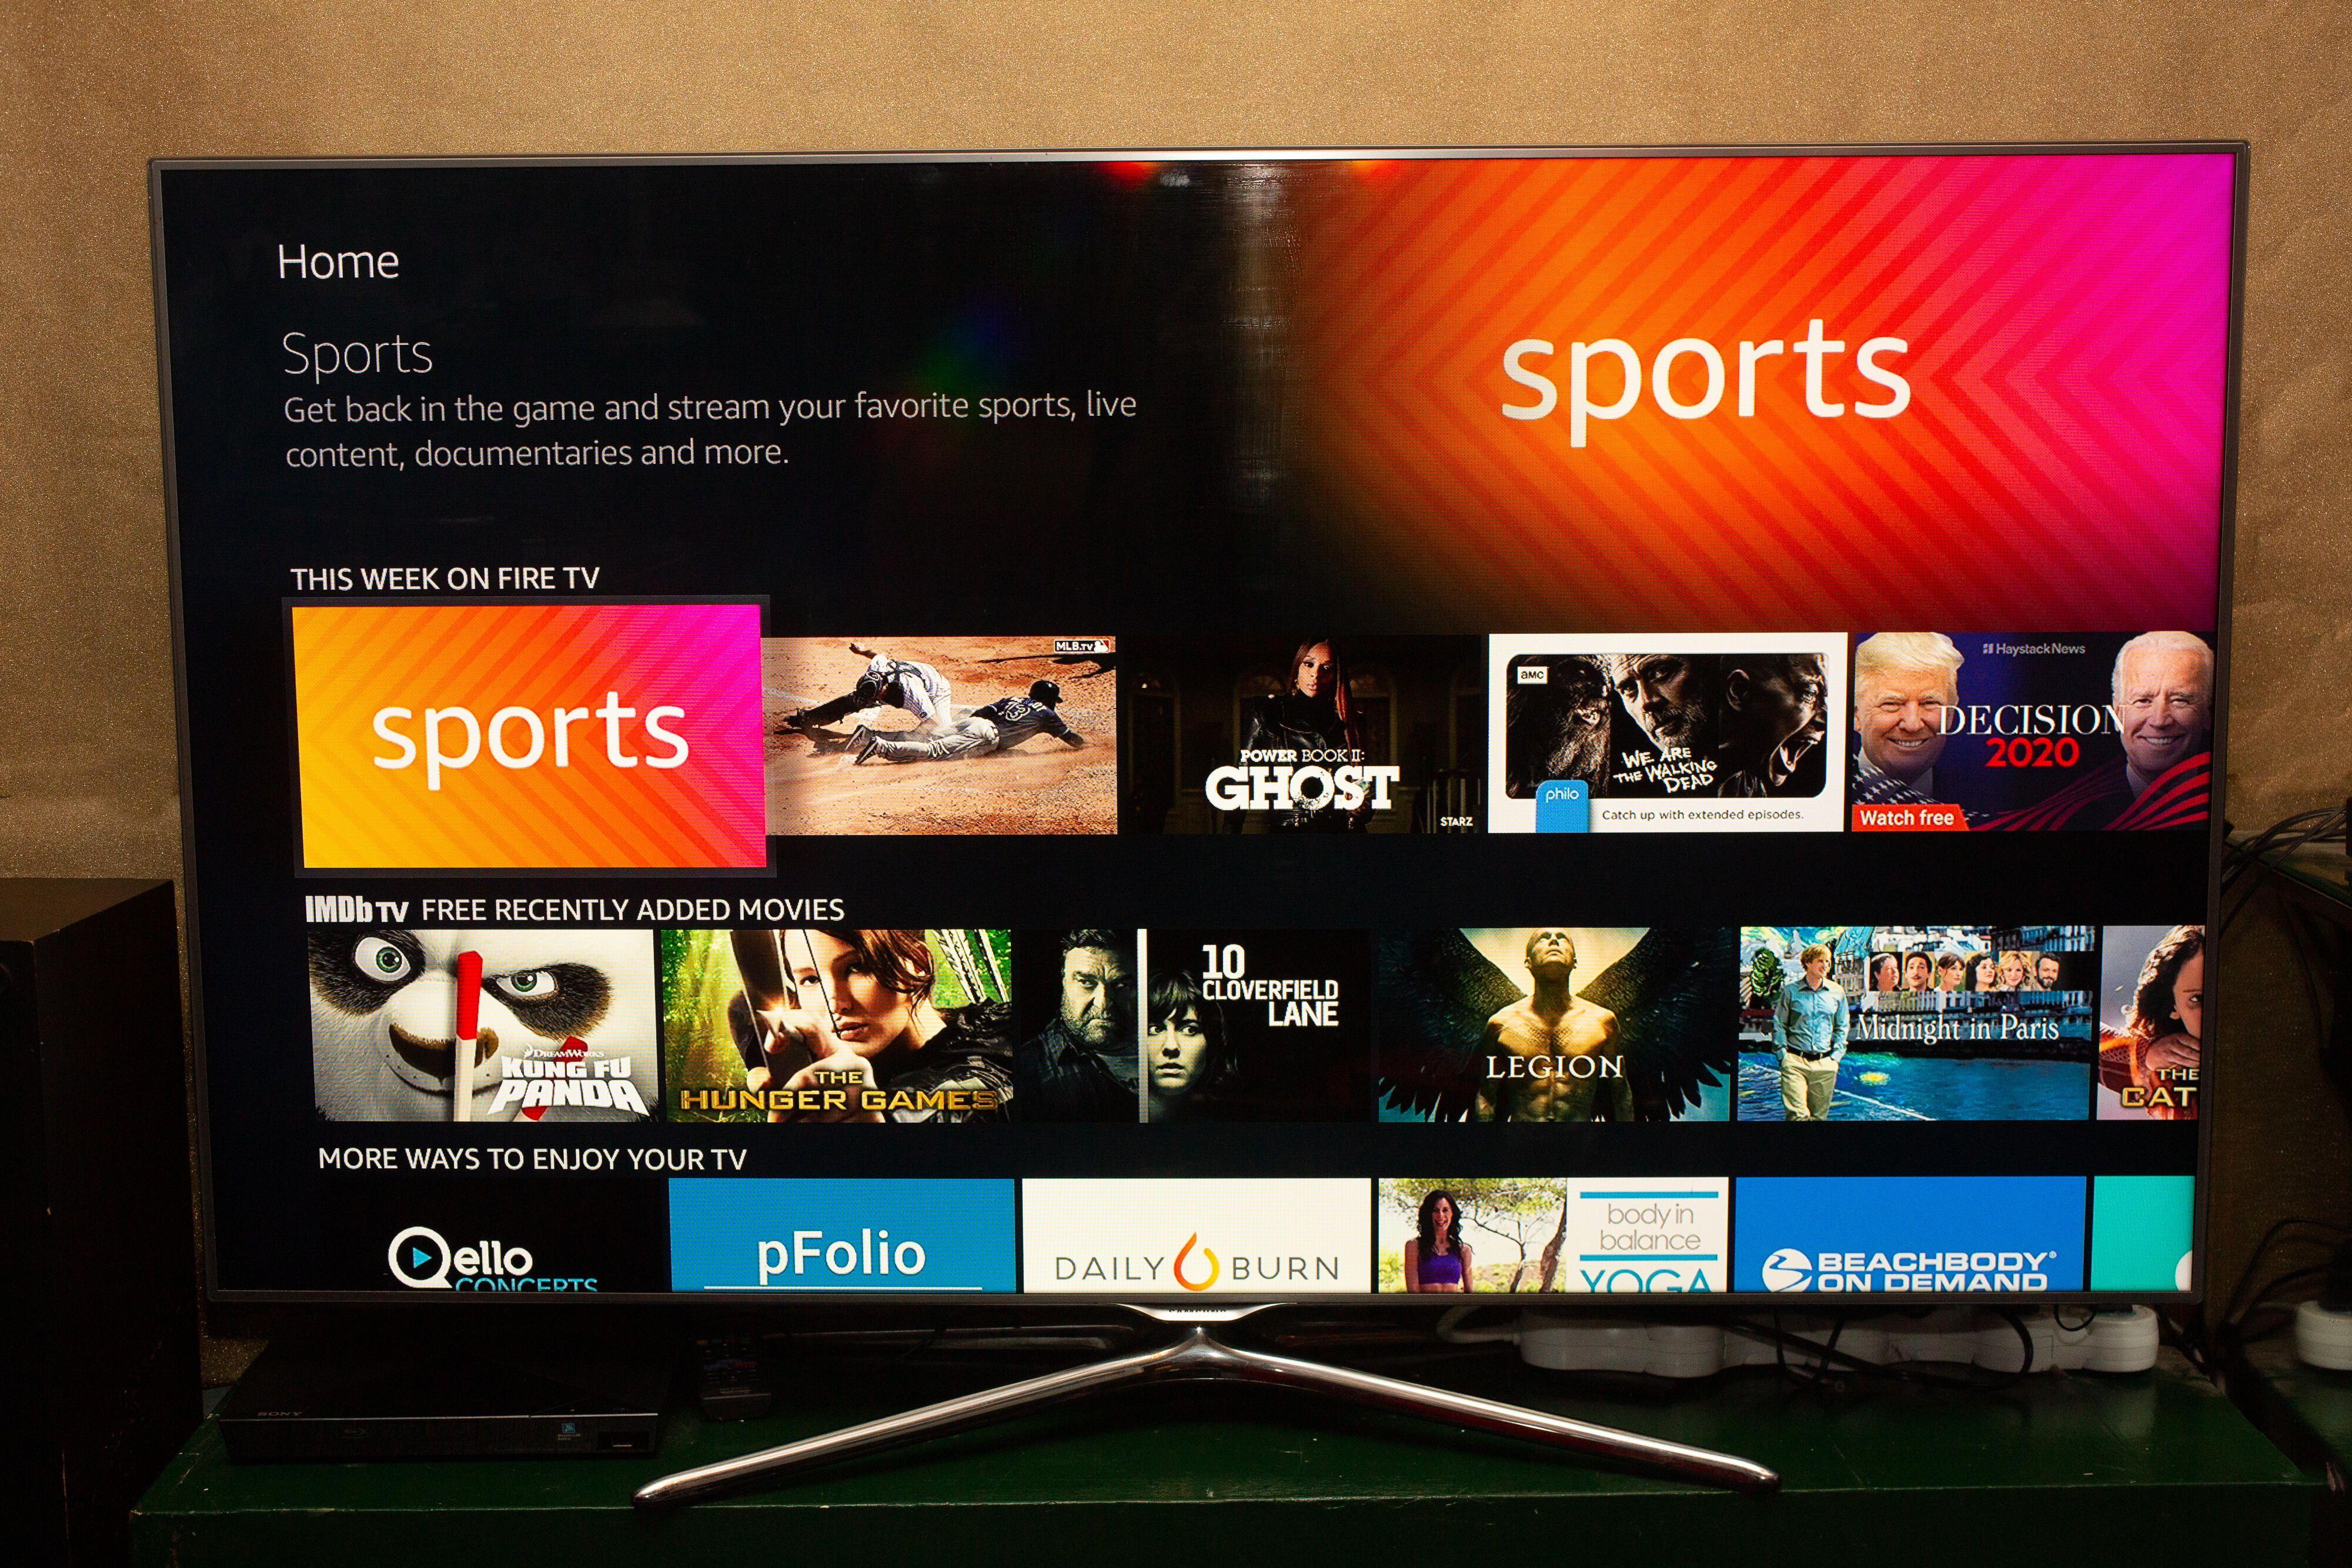 054-amazon-fire-stick-tv-and-fire-stick-lite-menu-screens-2020